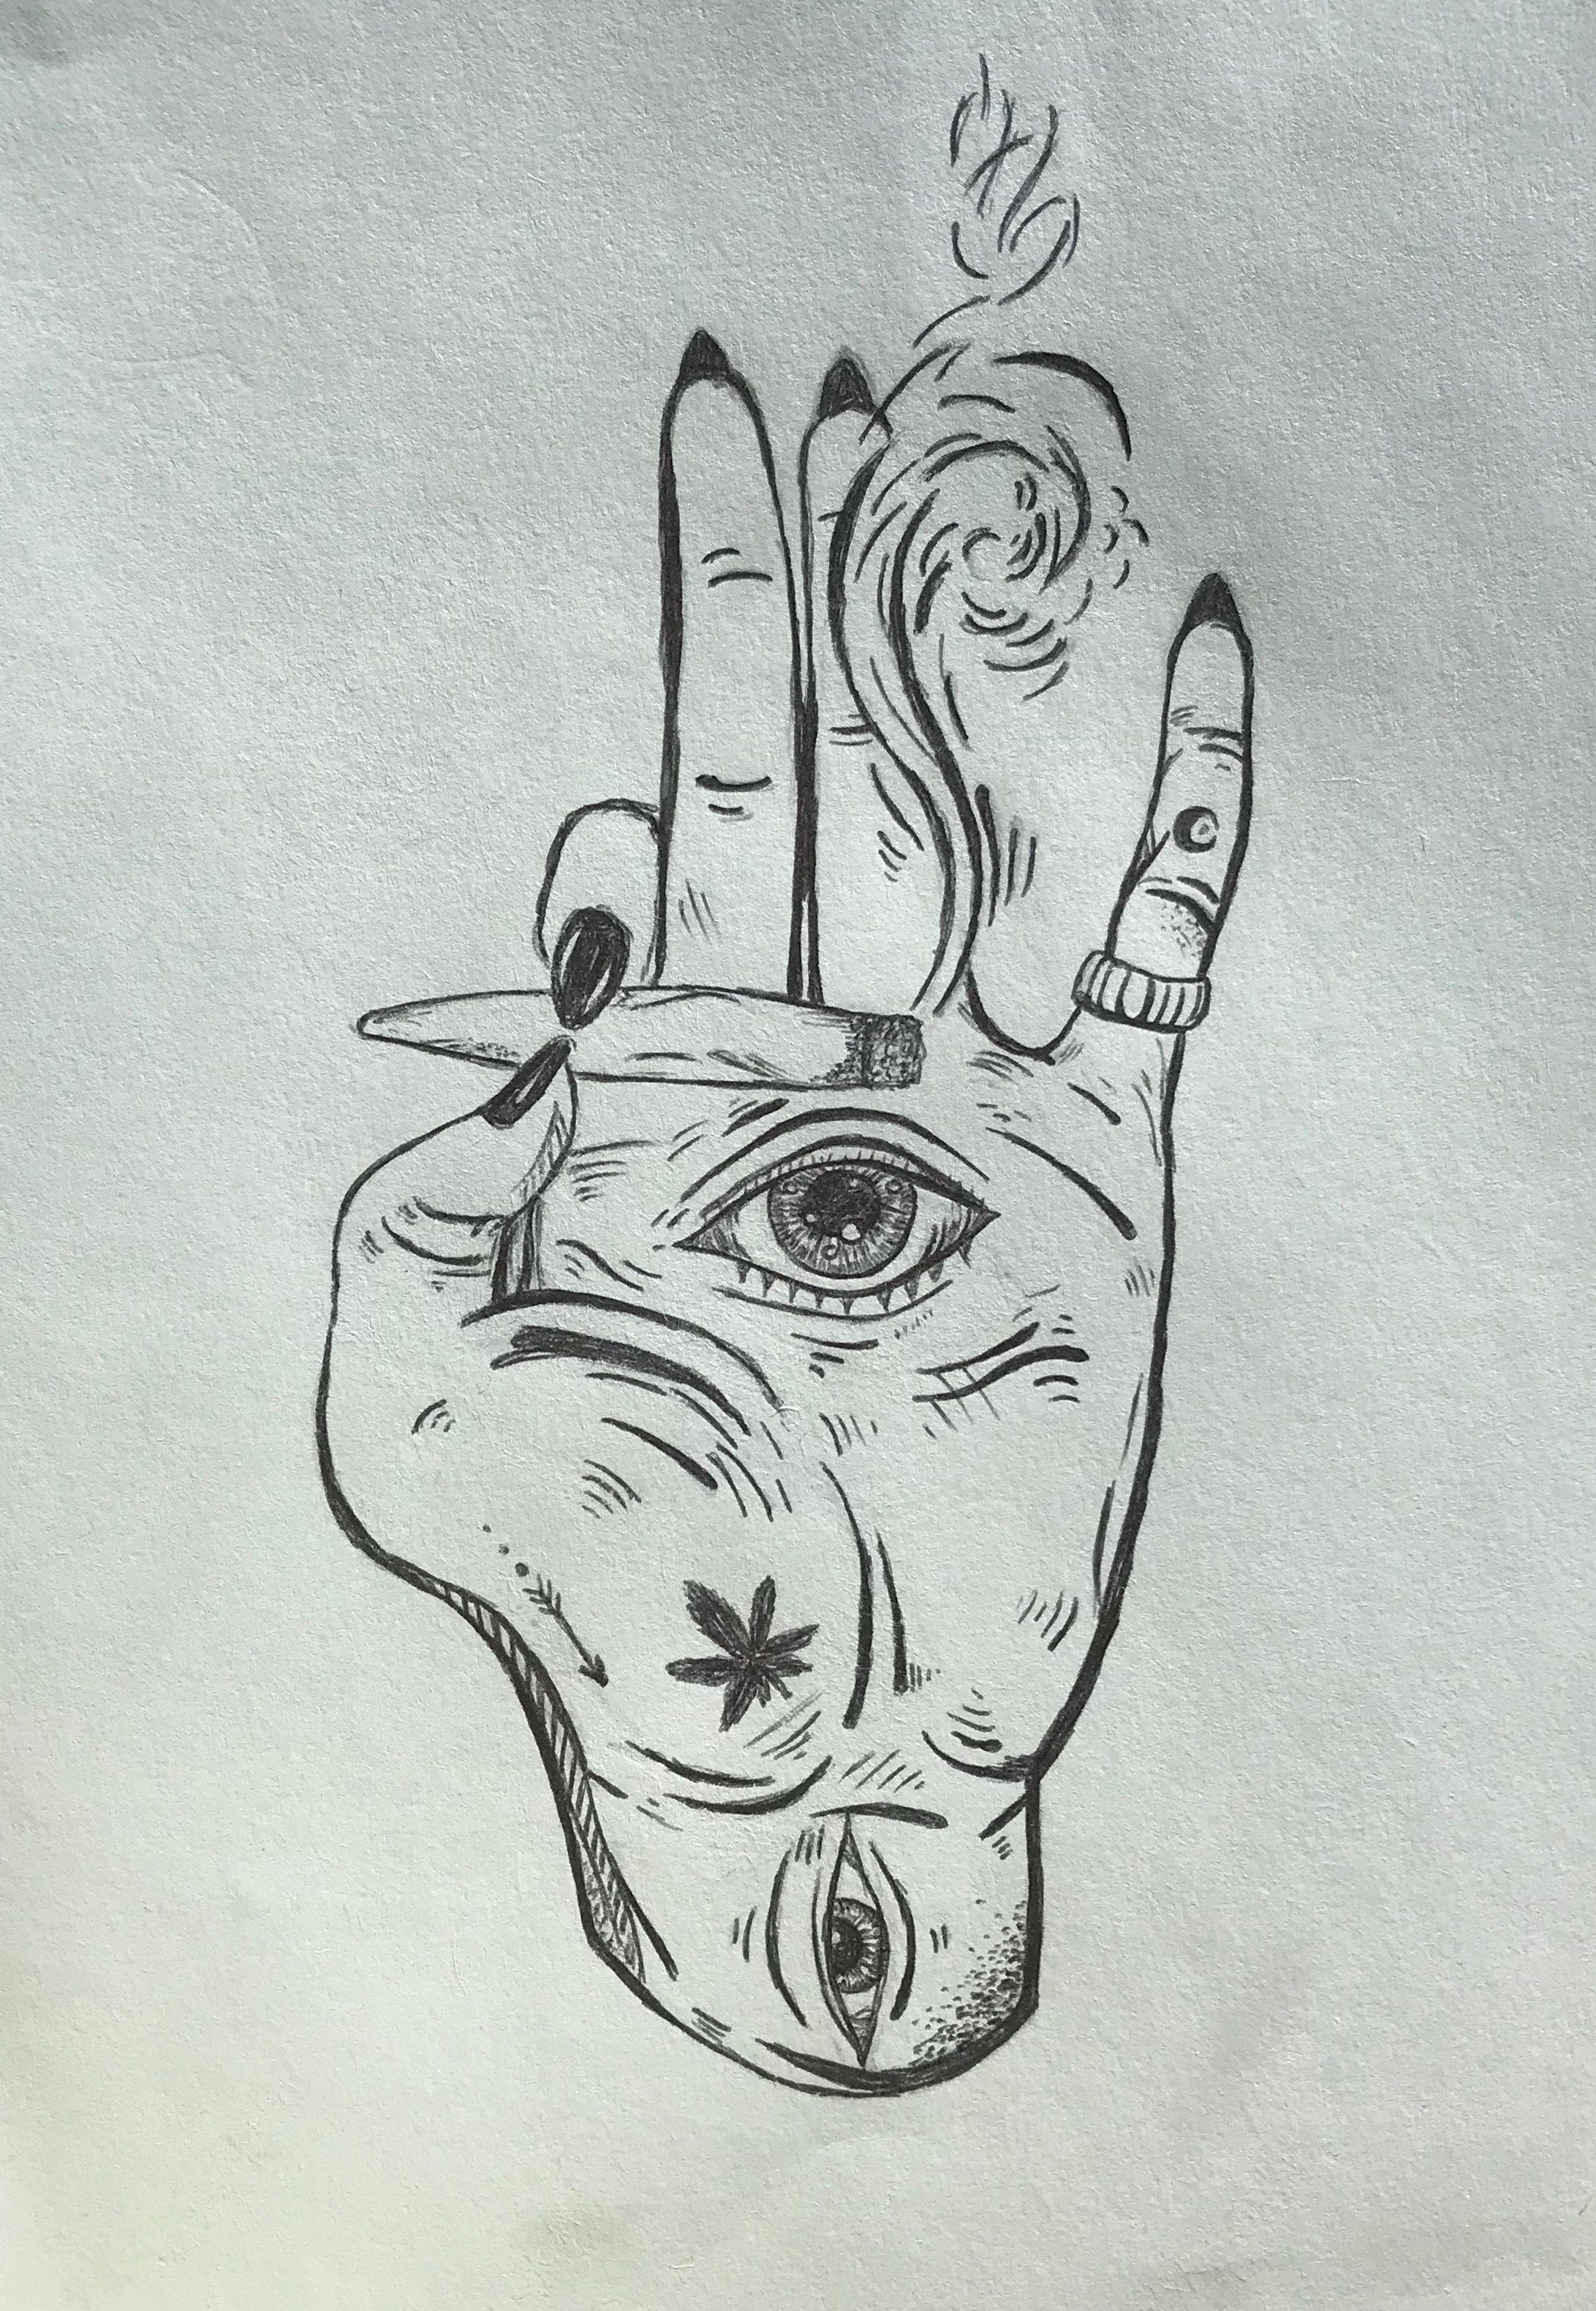 Trippy Stoner Tattoo Designs : trippy, stoner, tattoo, designs, Drawing, Daughter, Trippy, Drawings,, Sketches,